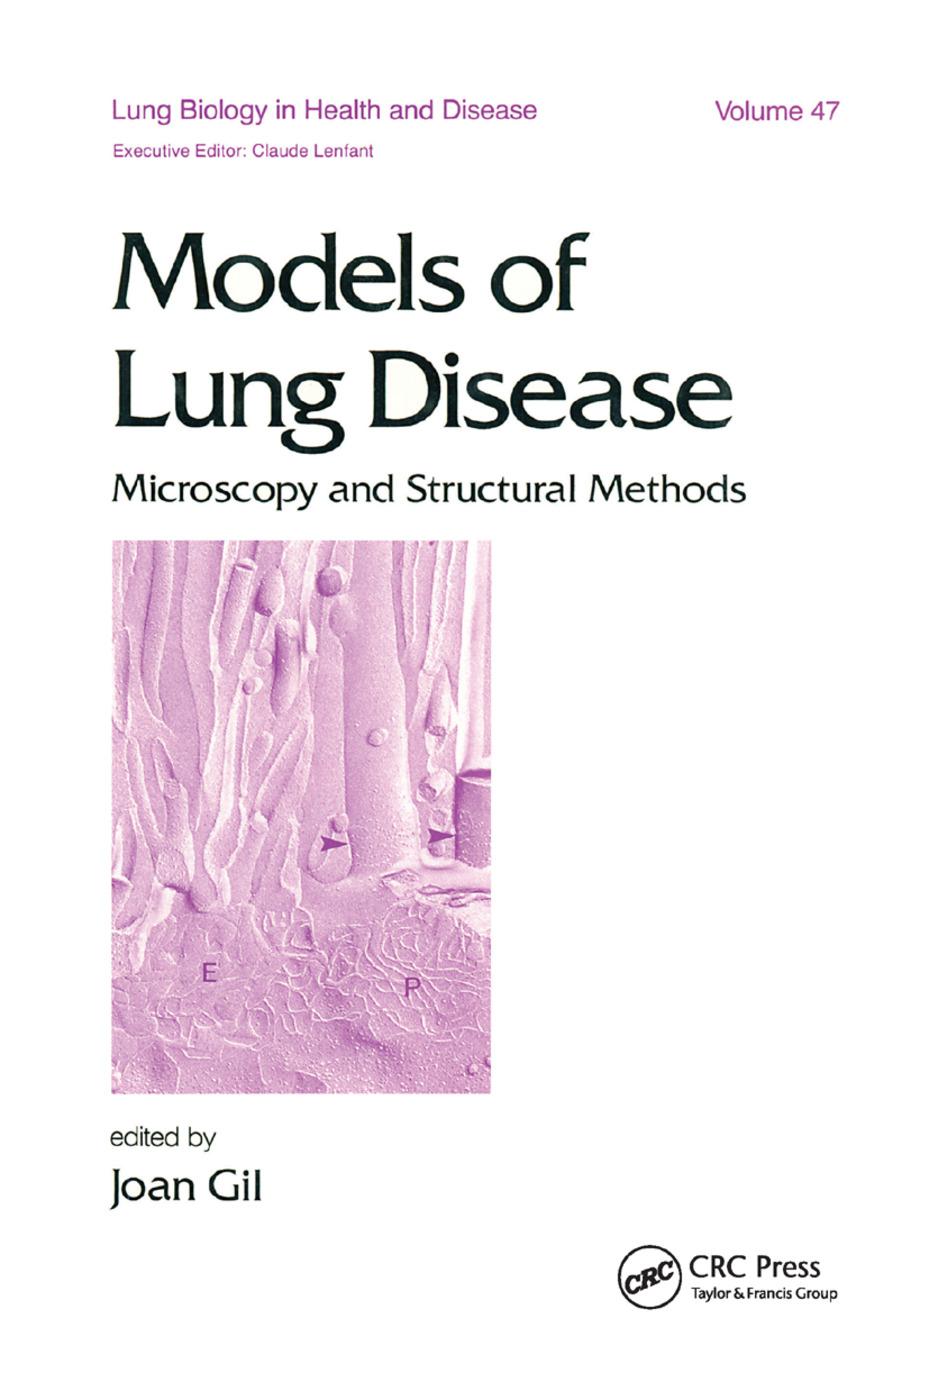 Models of Lung Disease